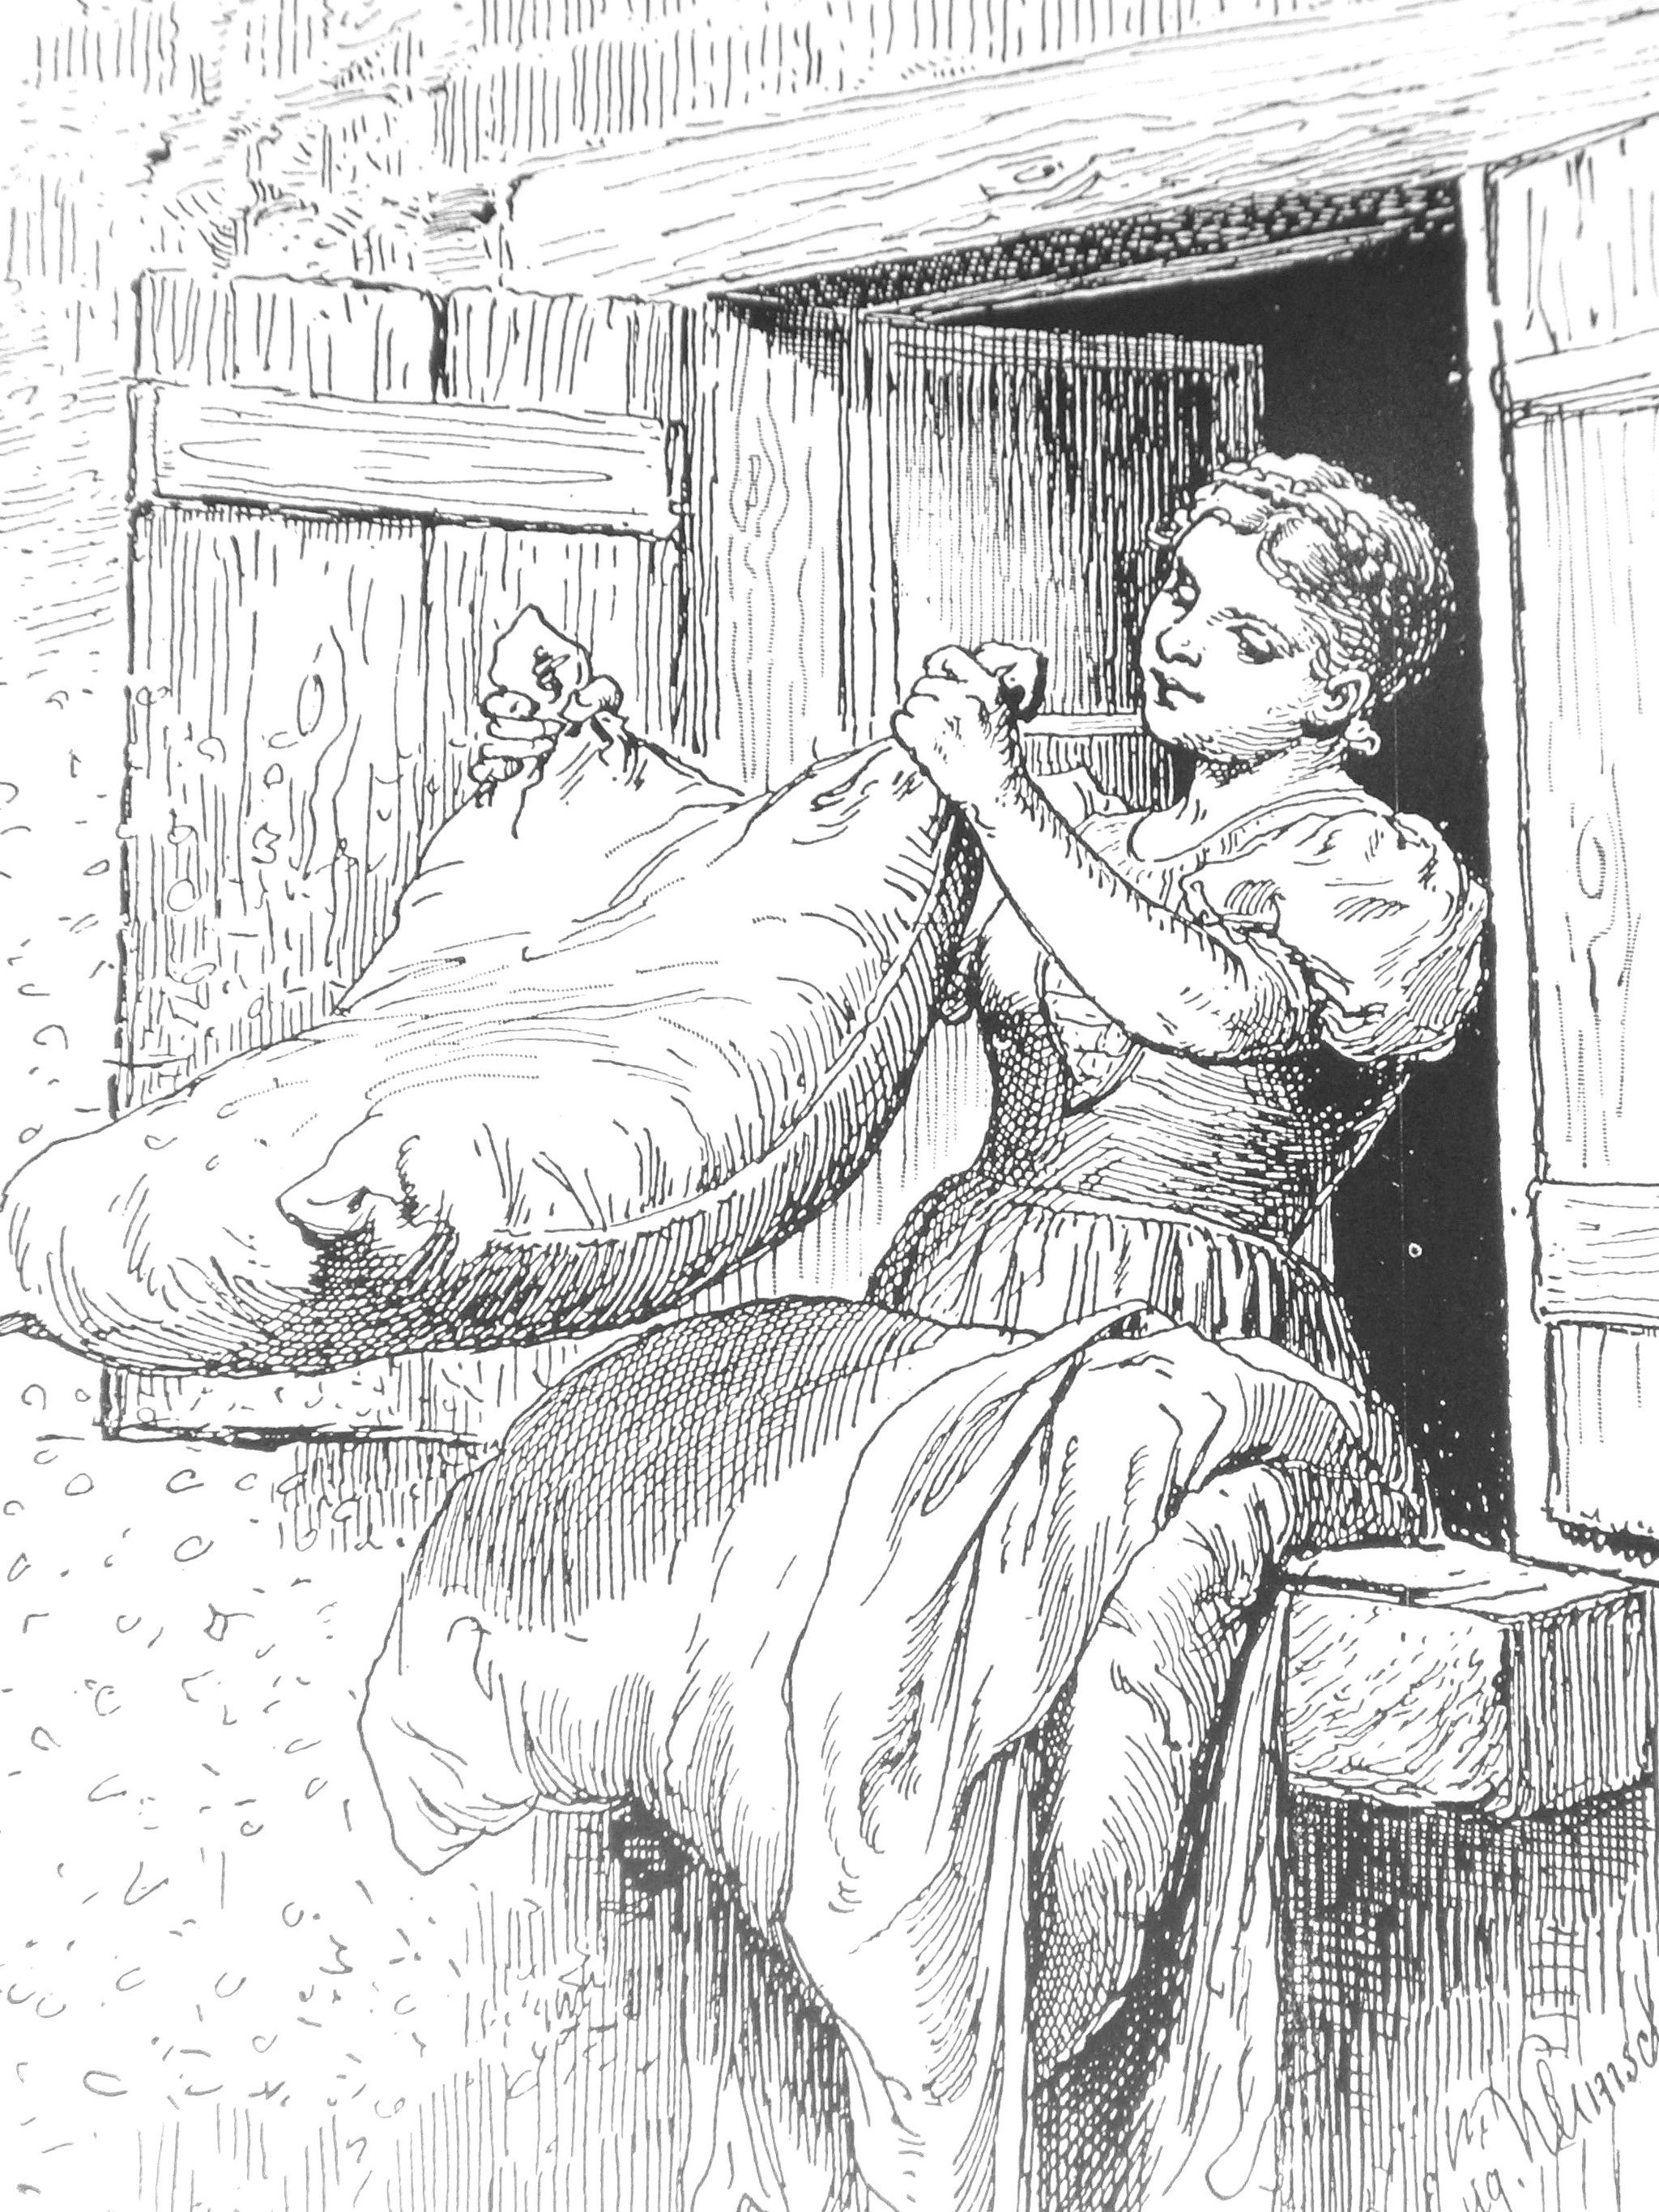 Betten machen bei Frau Holle